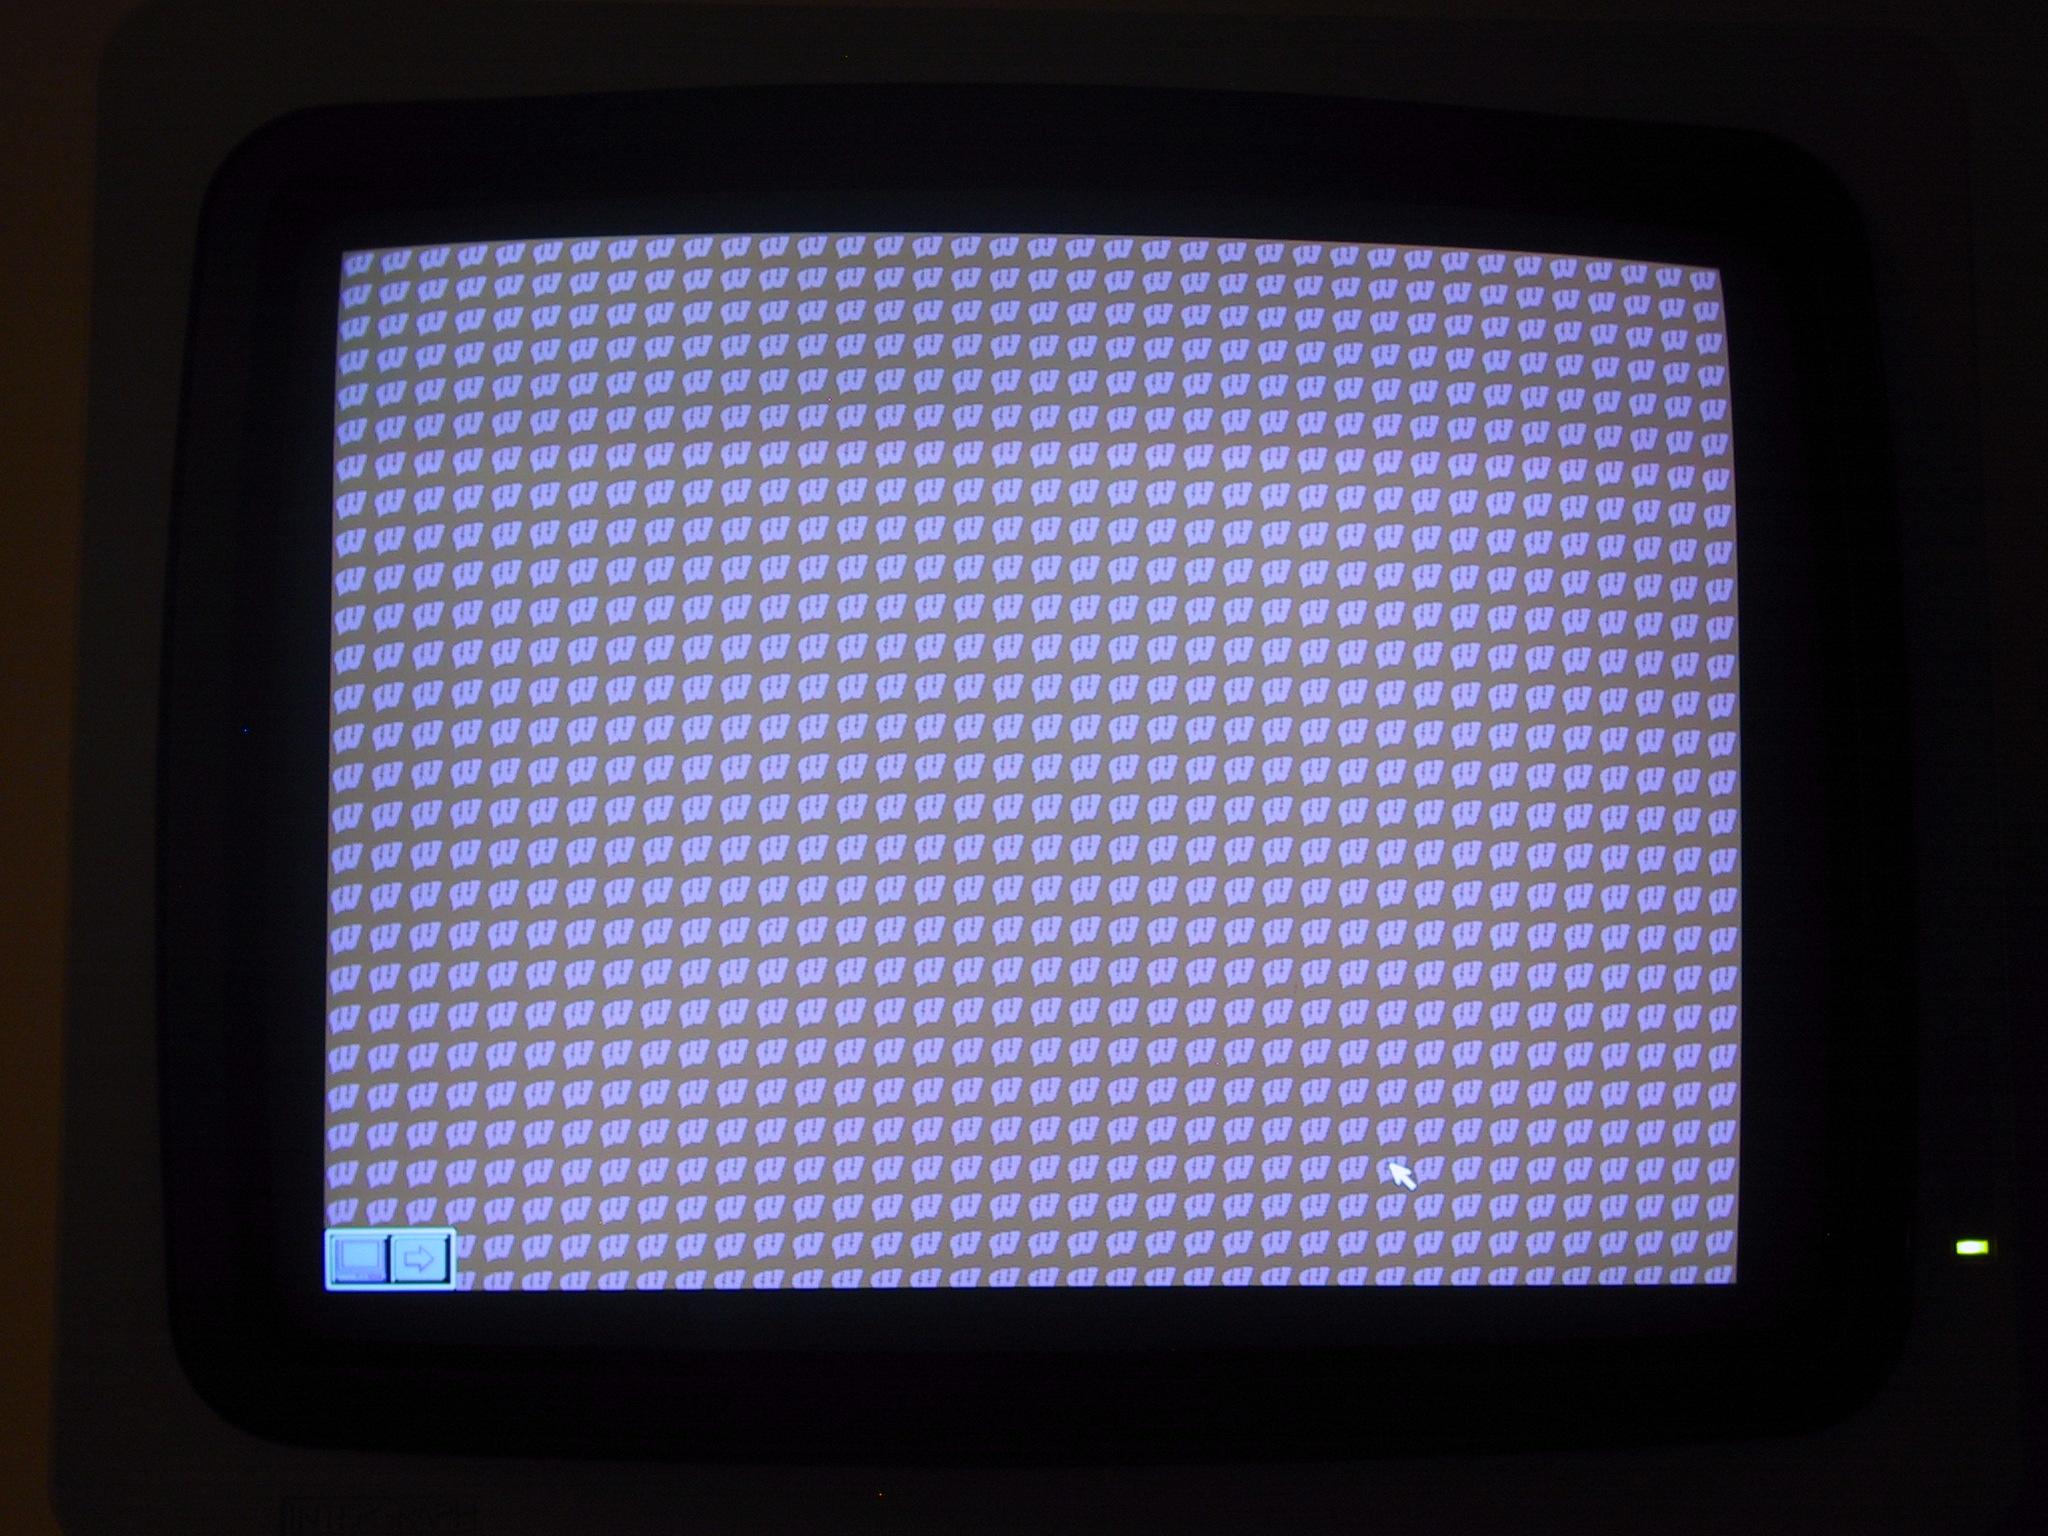 Intergraph InterPro 2020 CLIX OS UW Screen Background